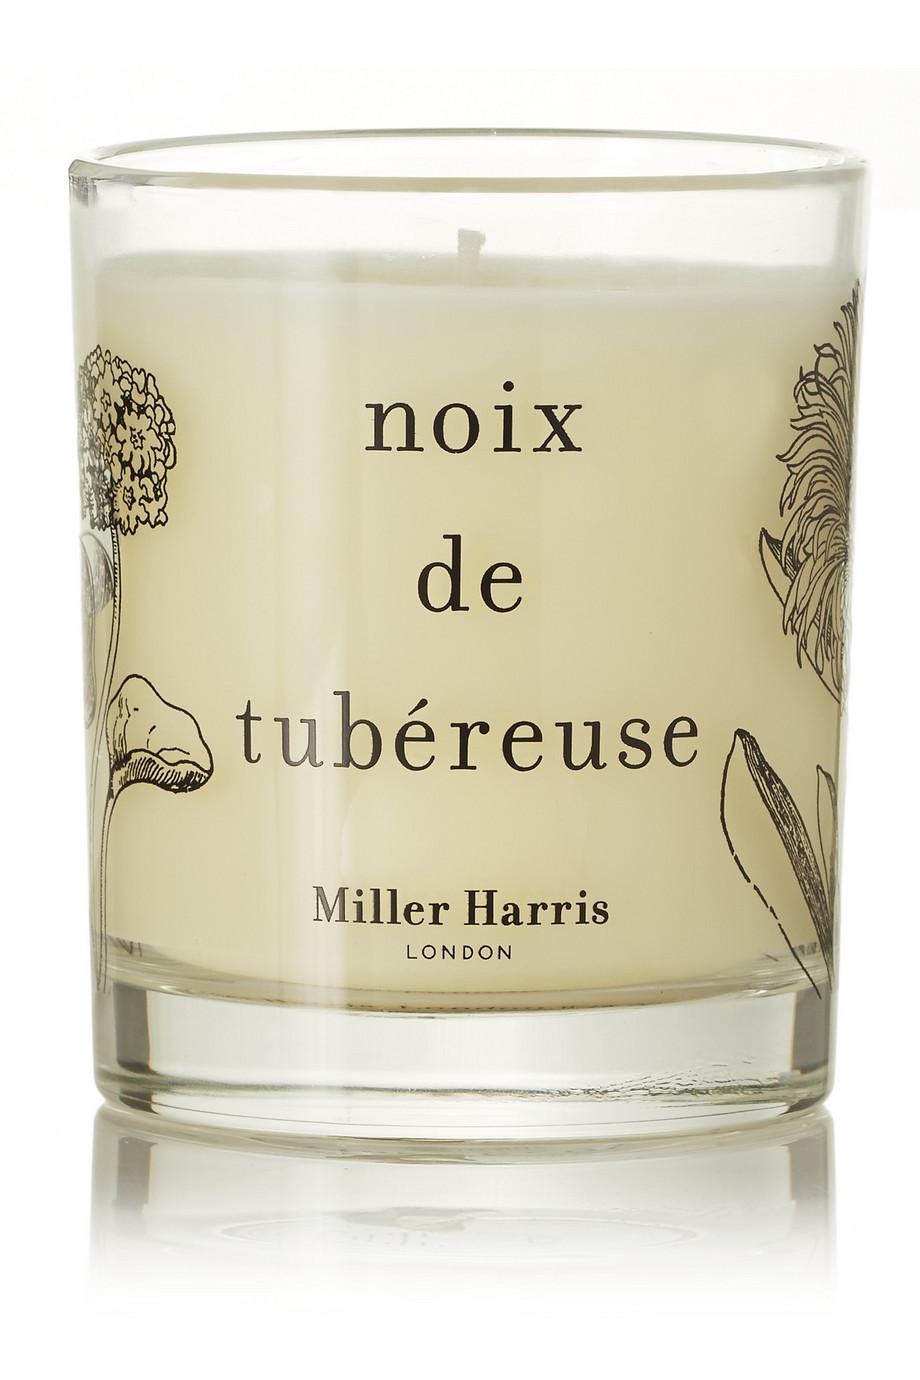 Noix De Tubéreuse Scented Candle - Tuberose Absolut & Vanilla, 185g